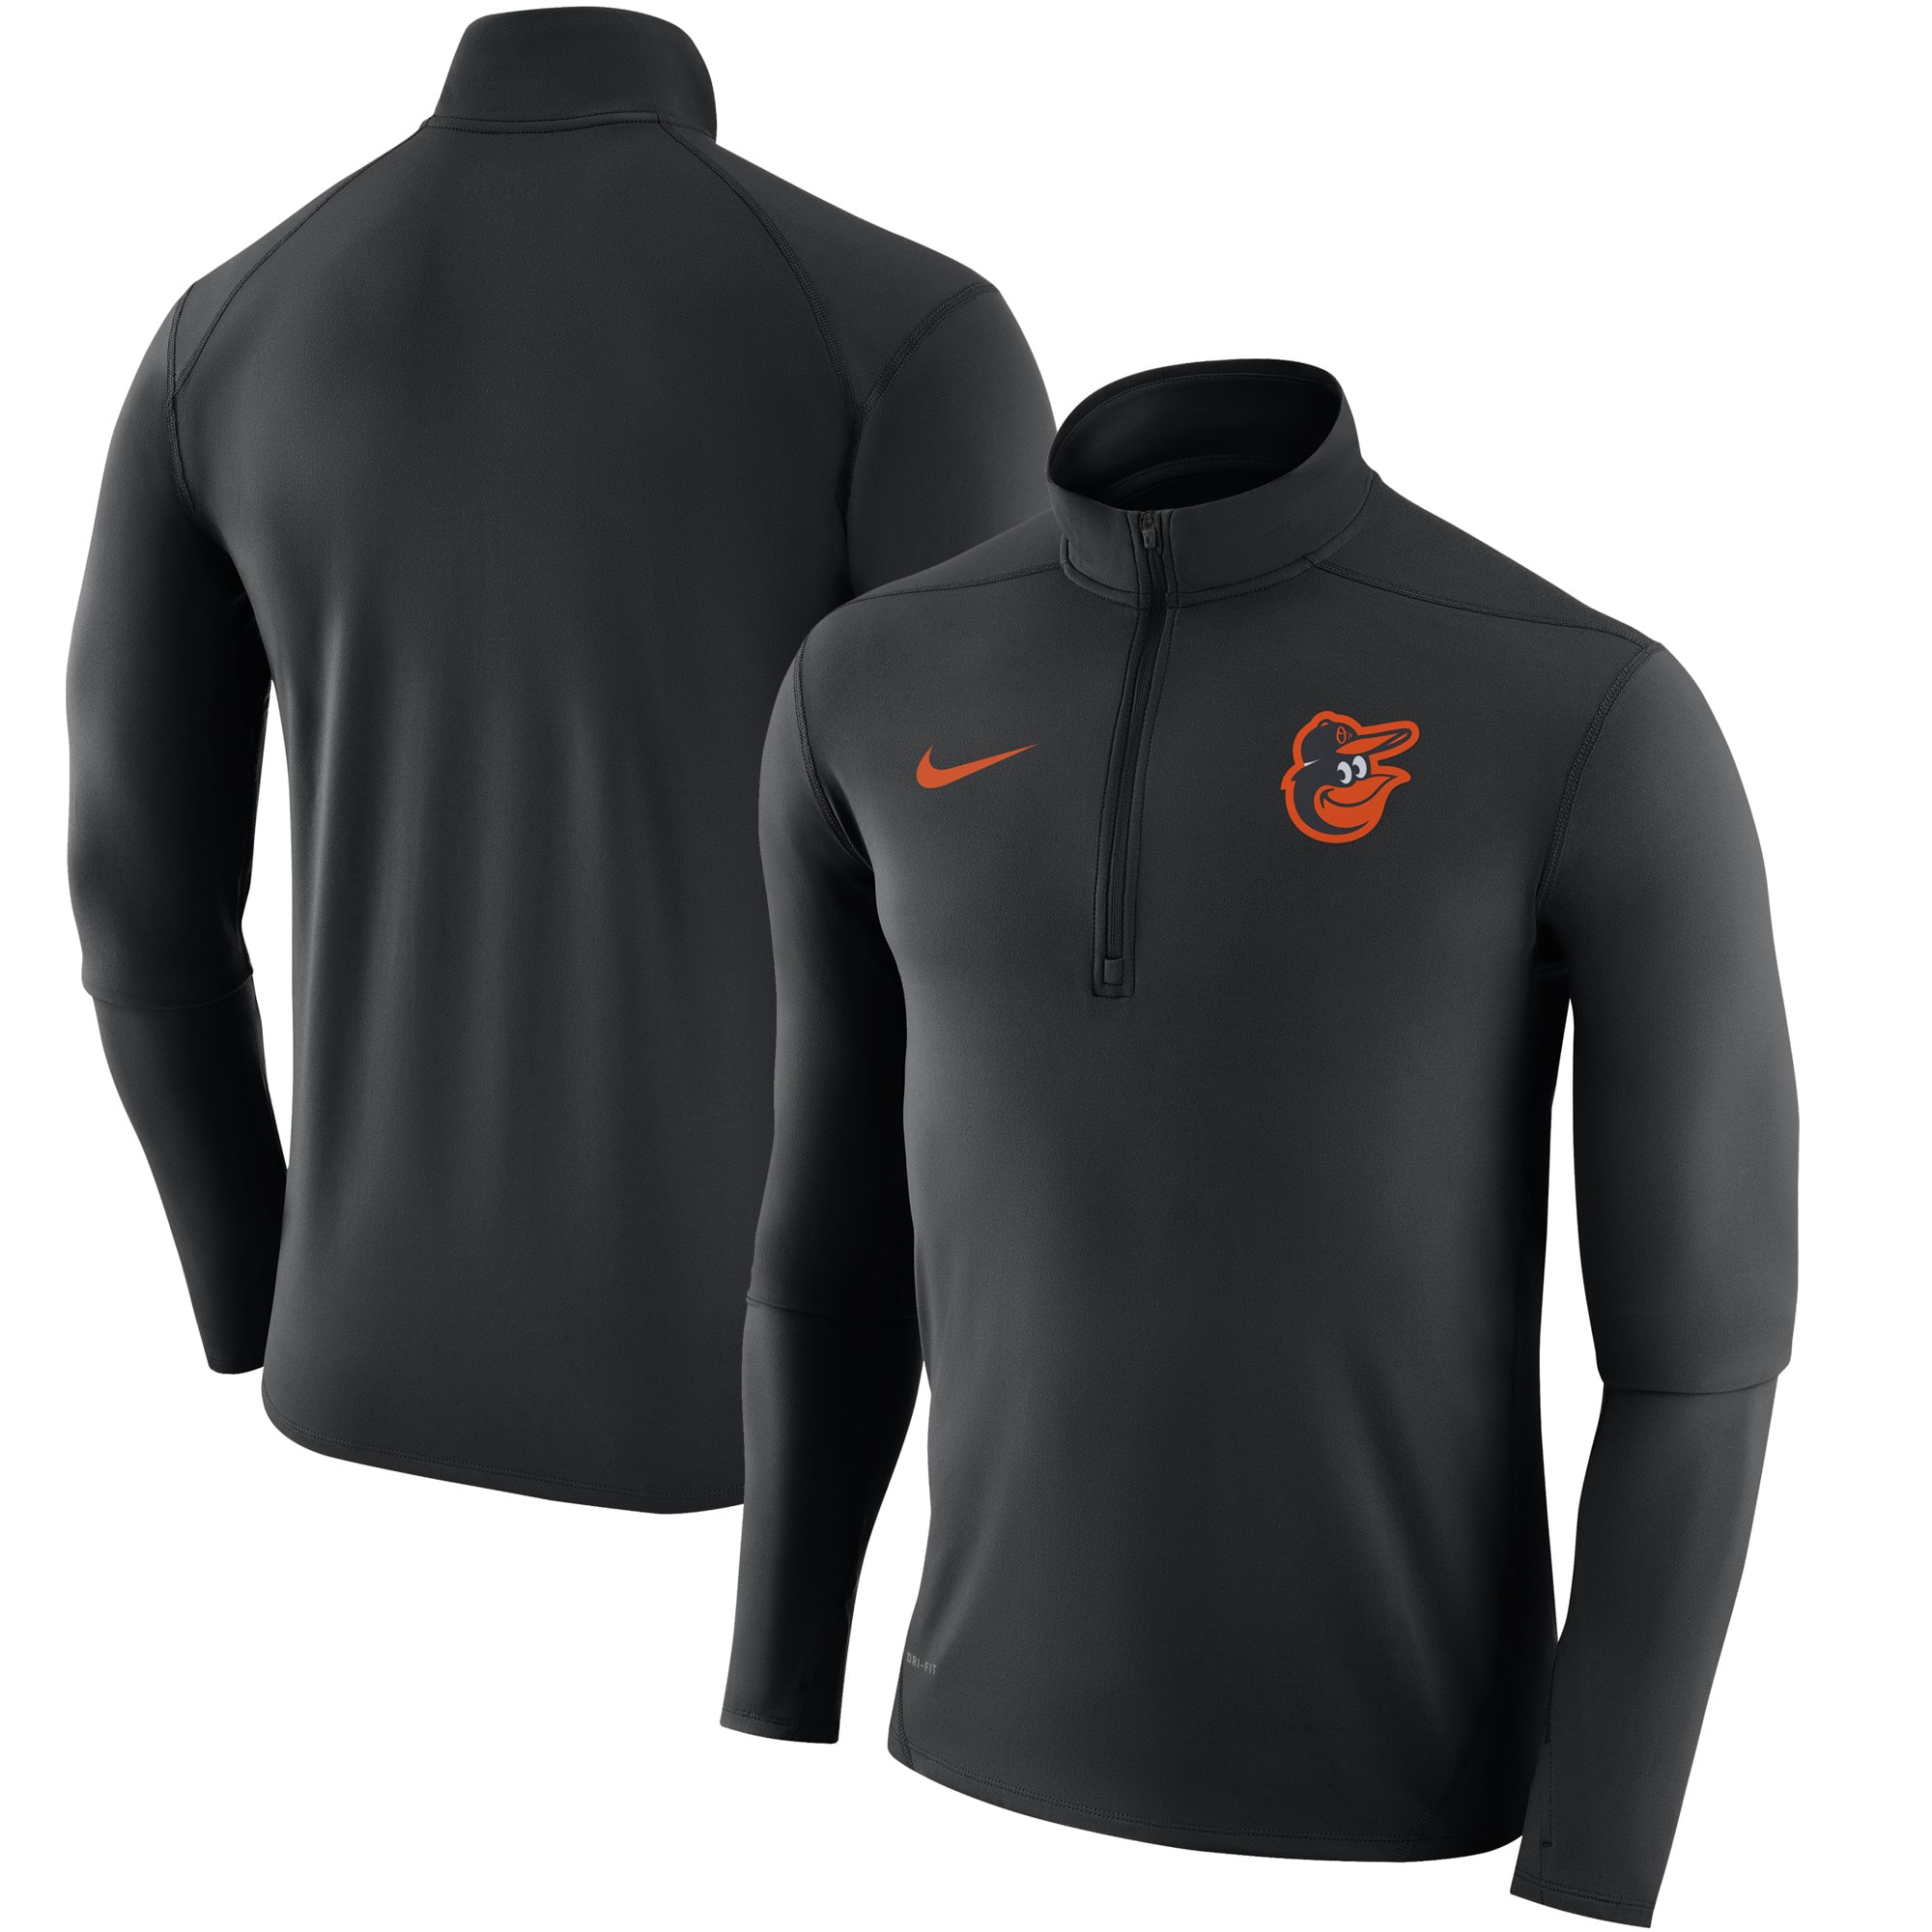 Baltimore Orioles Nike Element Half-Zip Performance Top - Black